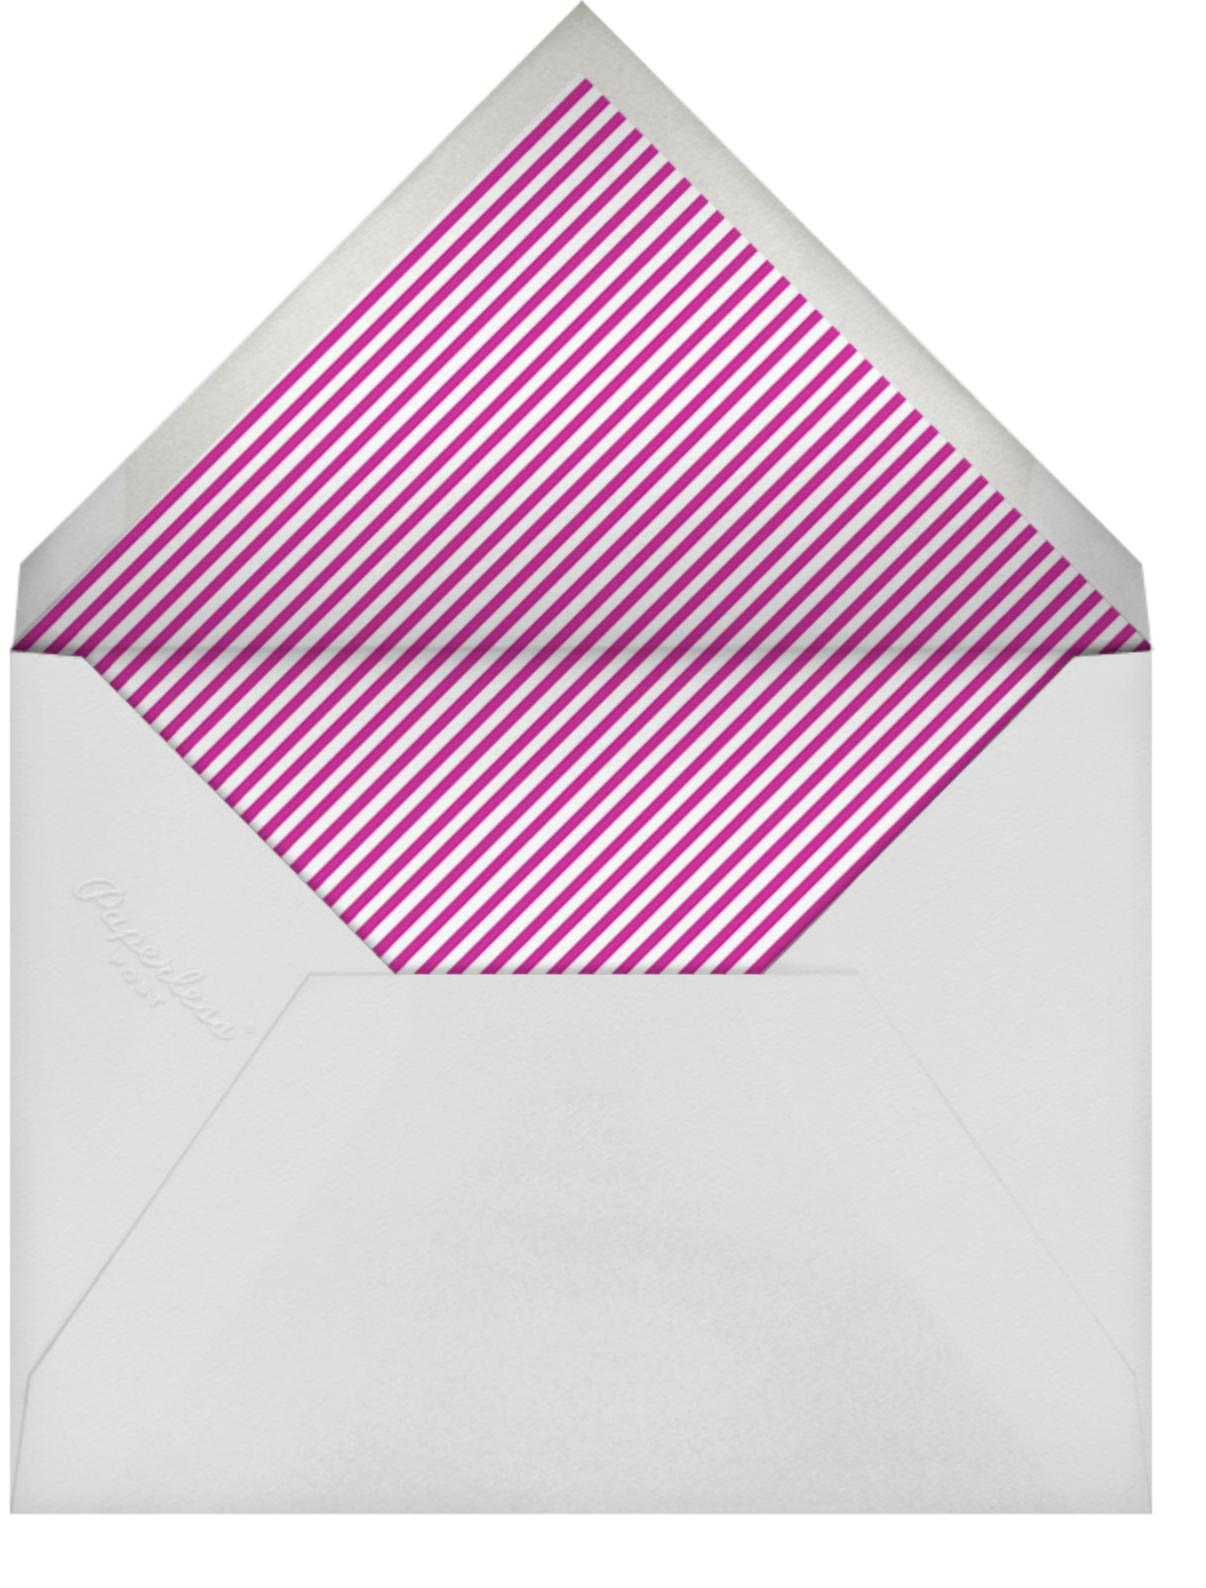 Stripe Border - Magenta - Paperless Post - Cocktail party - envelope back